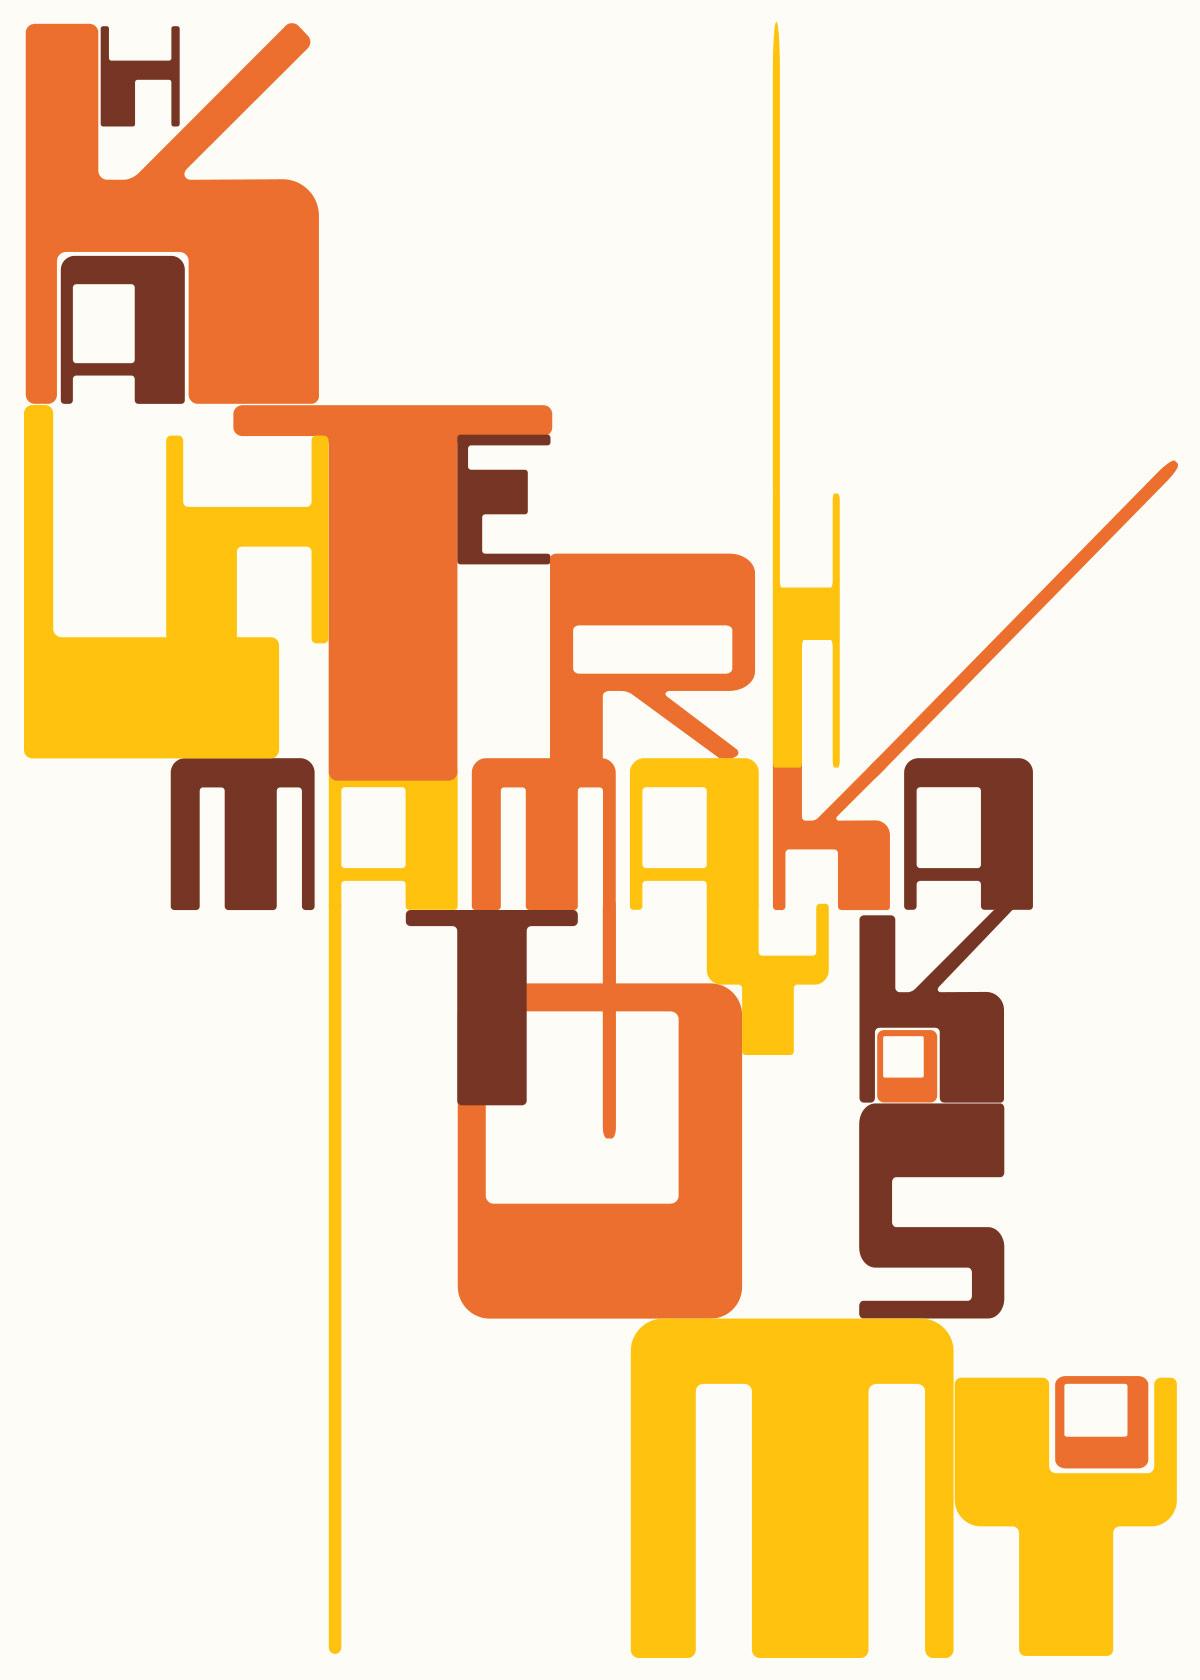 Typographic poster by Sabine Handtke